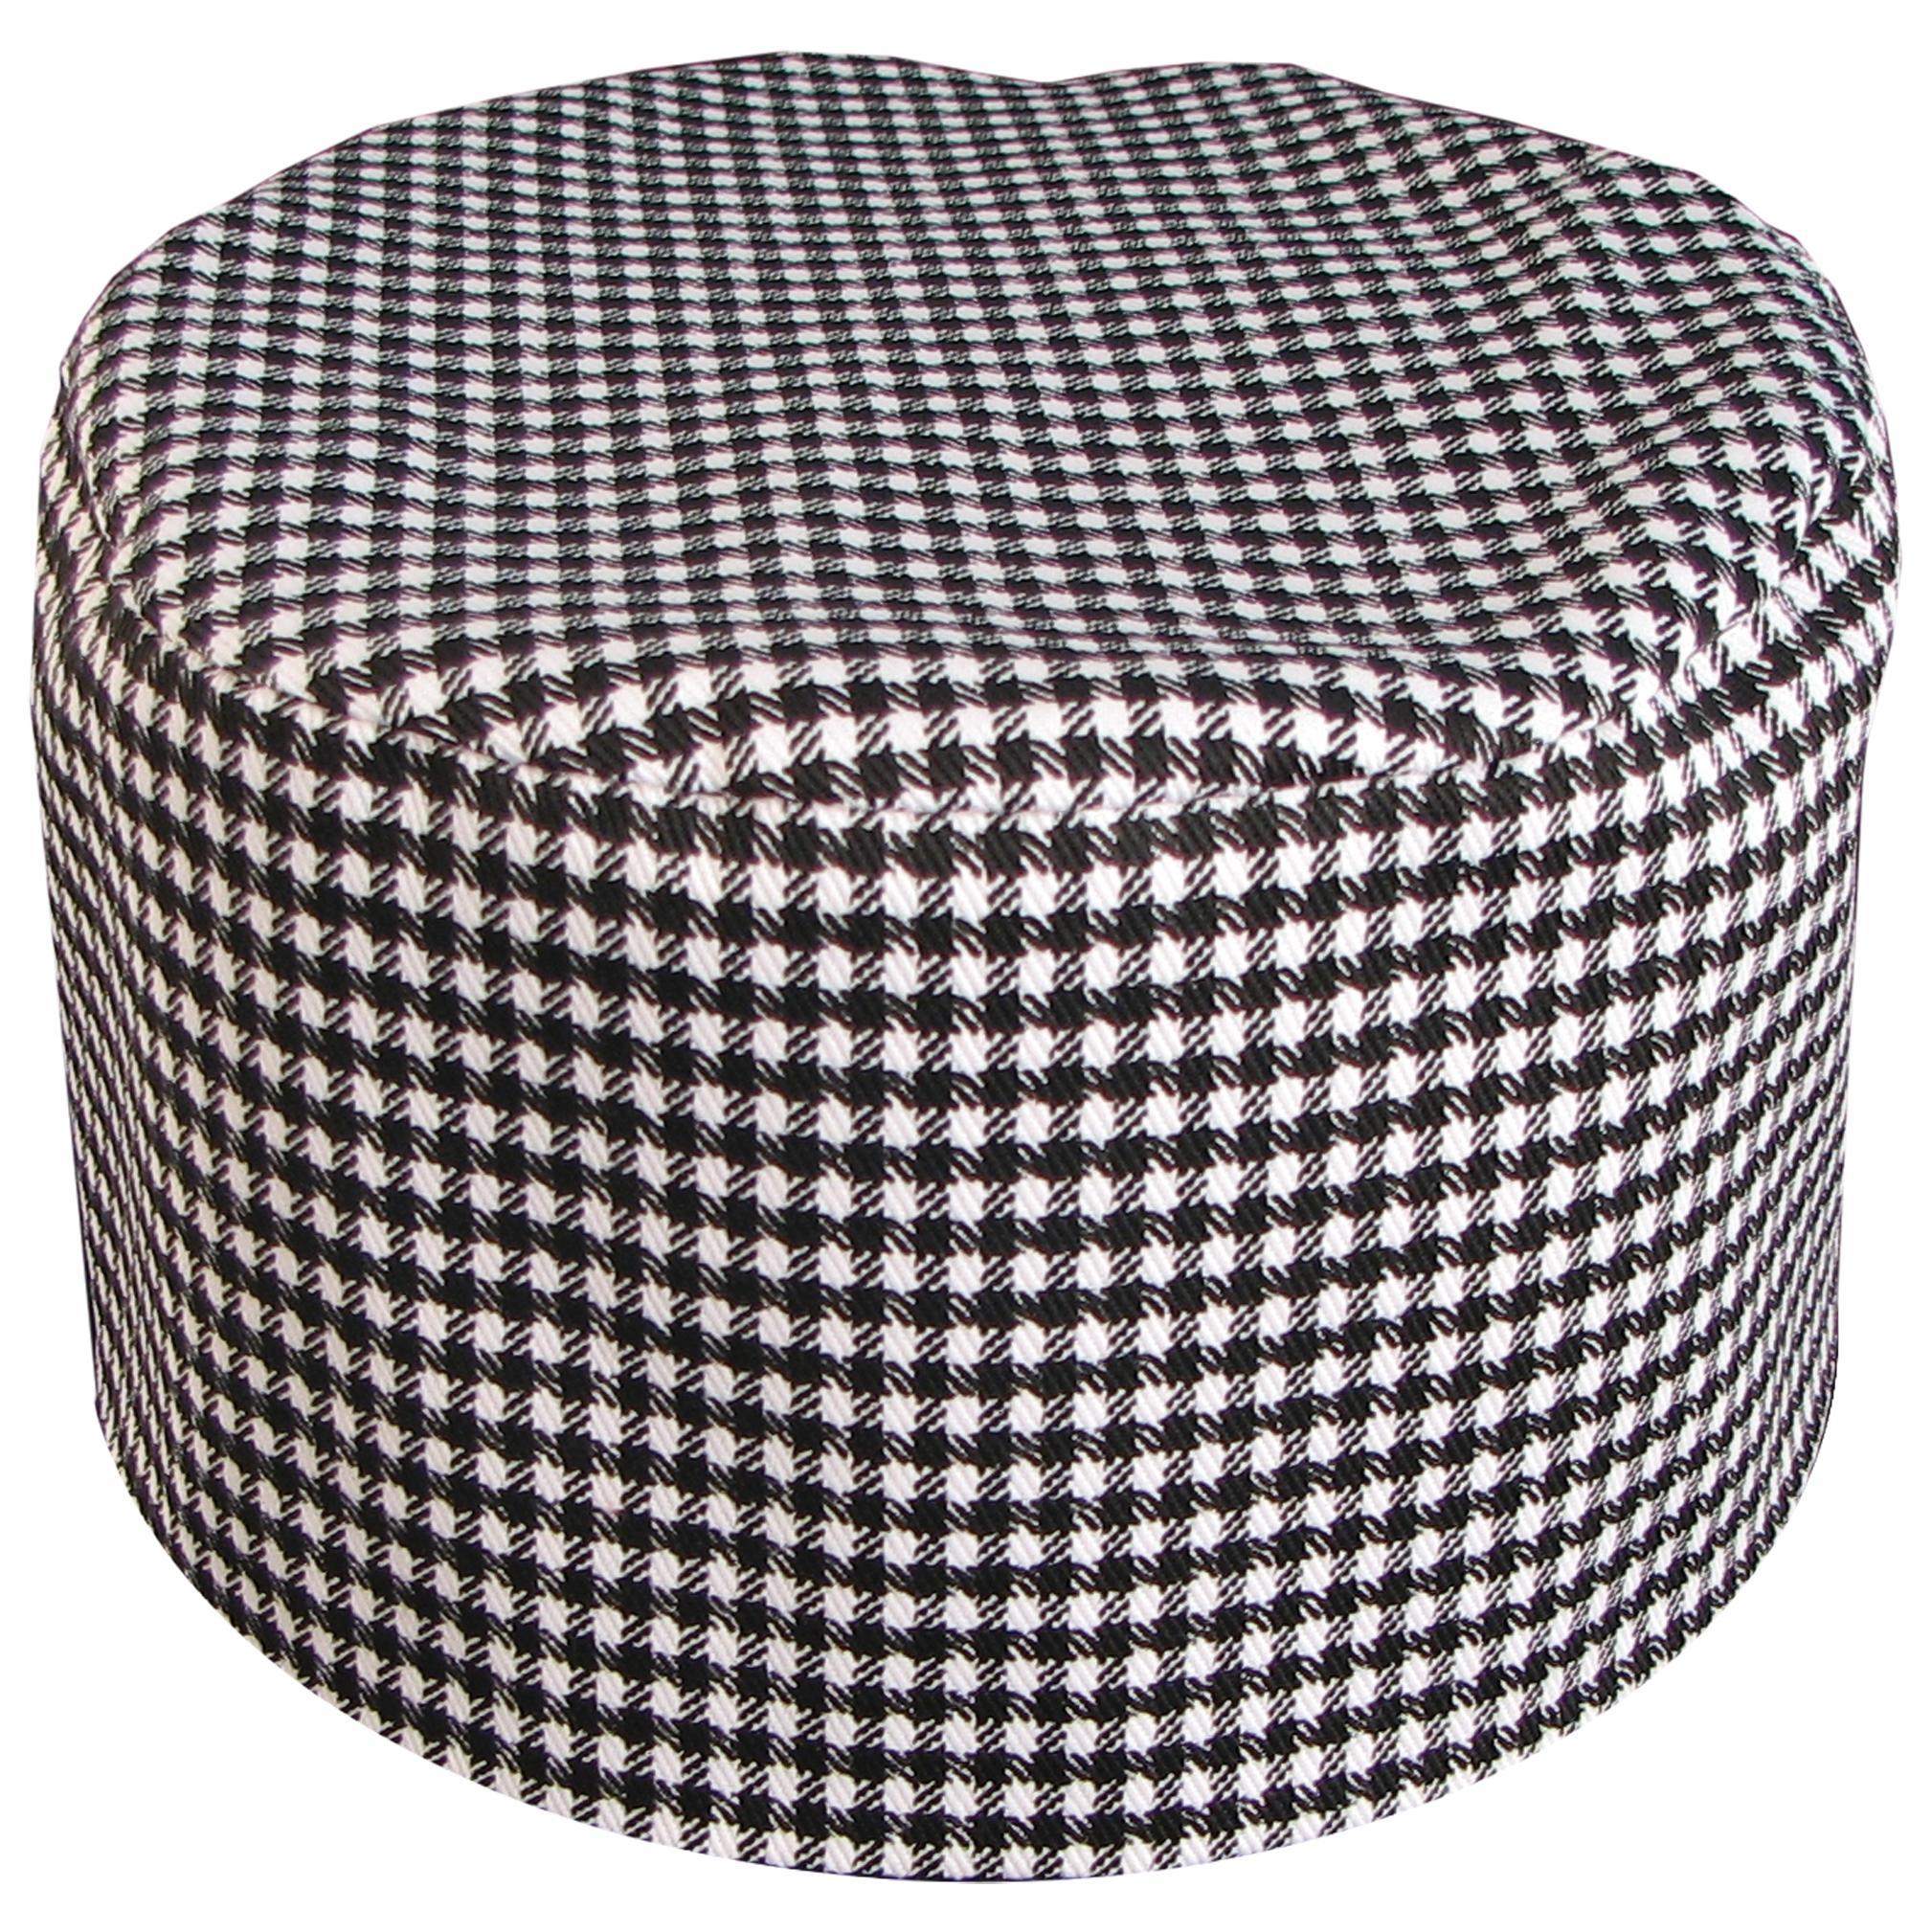 Fame Fabrics C21 PILL BOX HAT FINE LINE